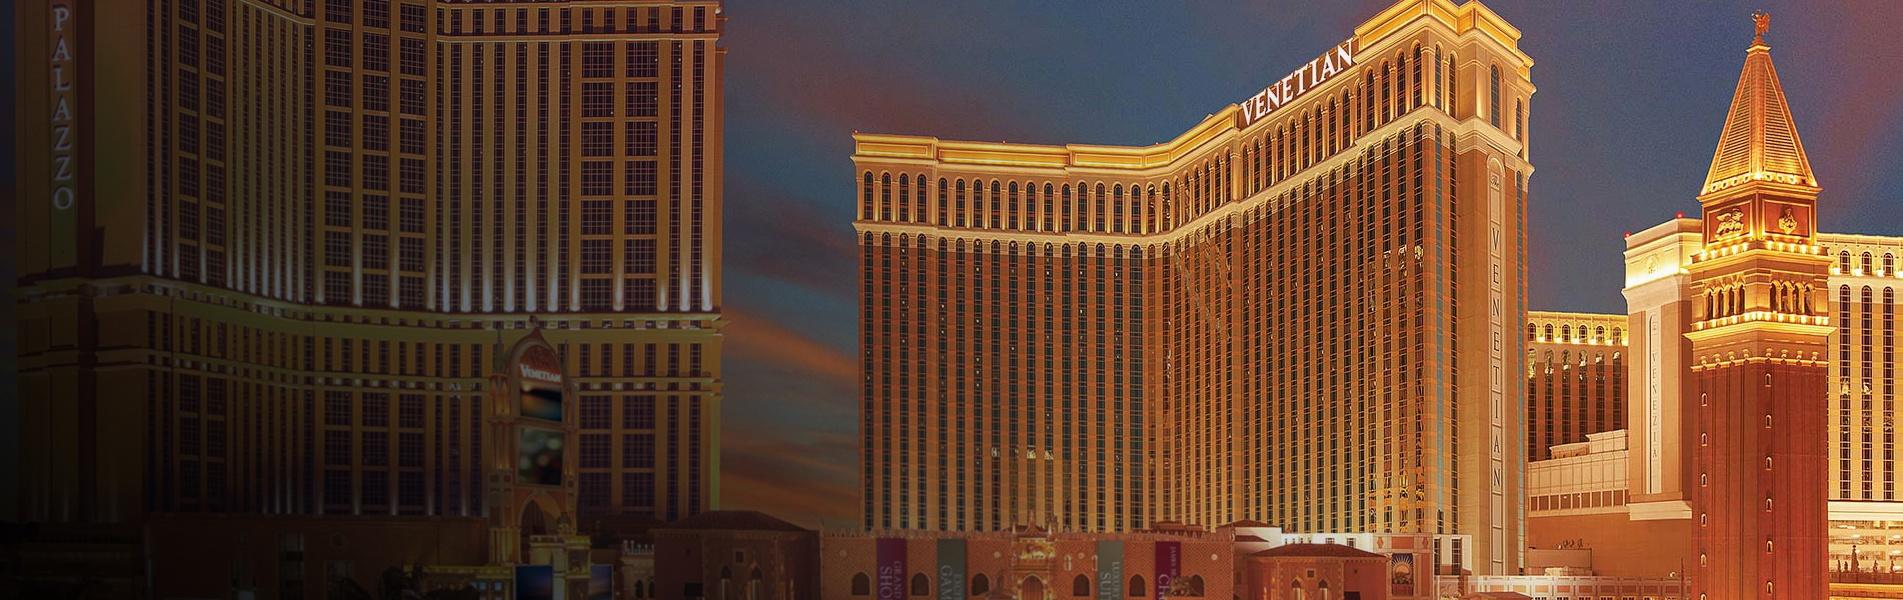 Venetian Casino Las Vegas 1